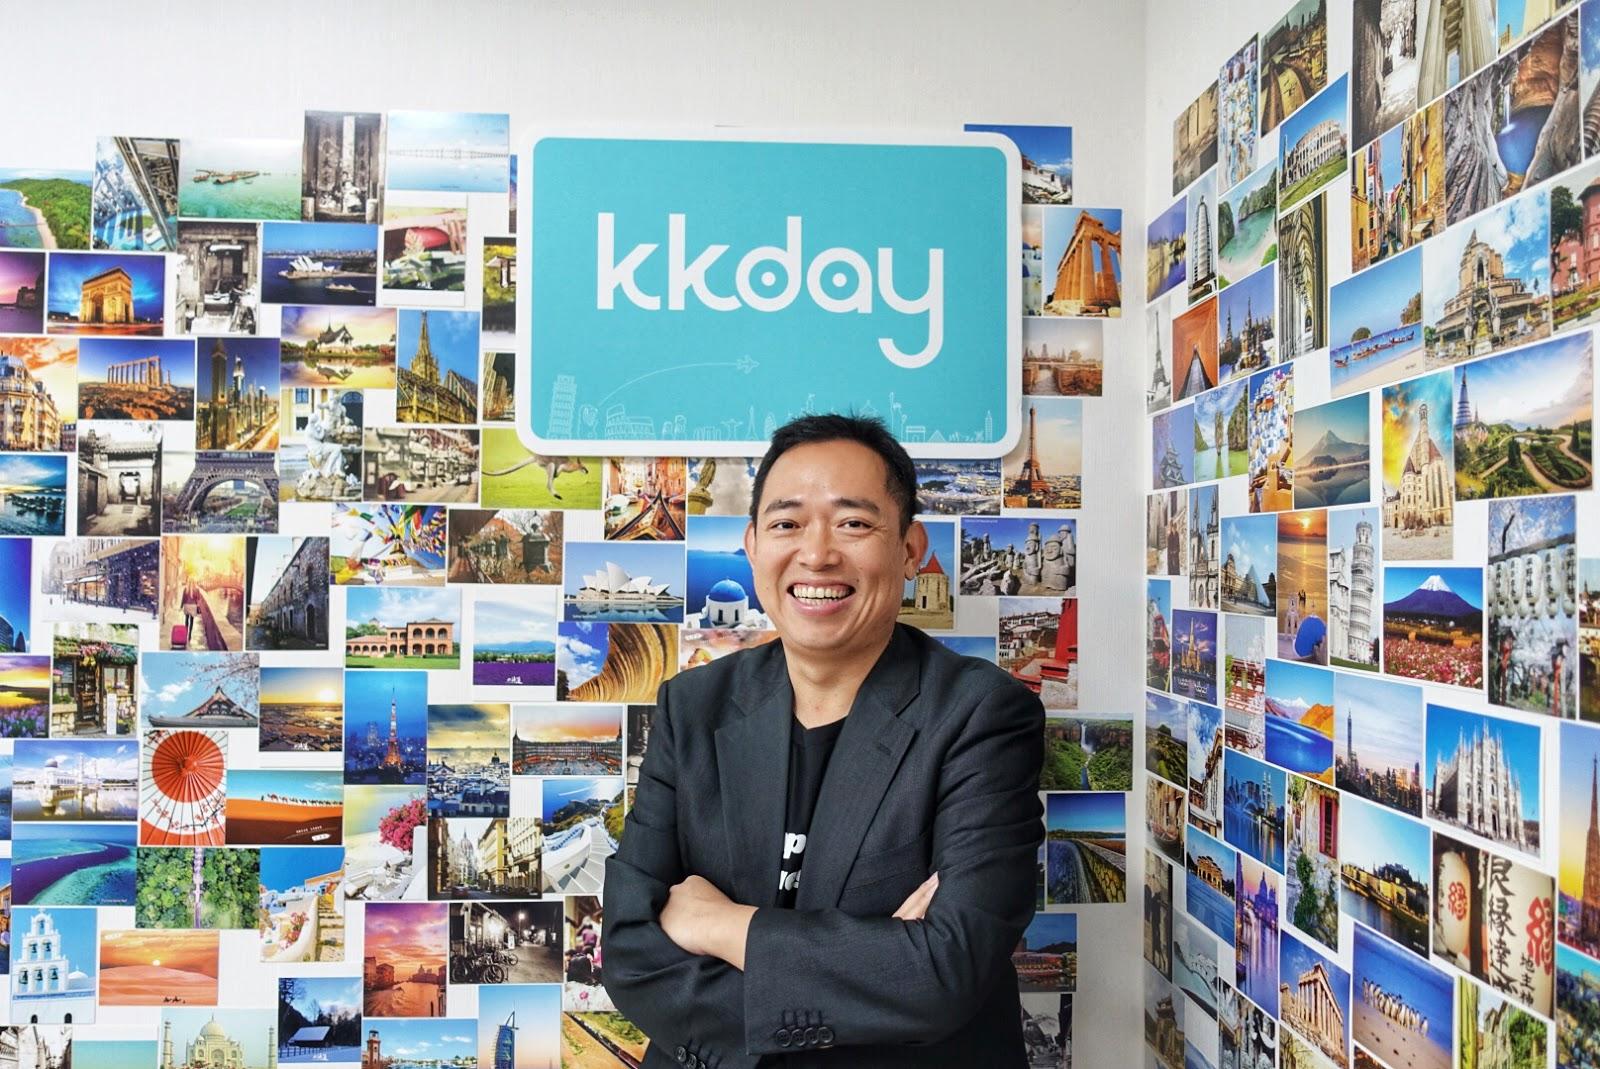 HIS、台湾の現地ツアー予約「KKday」に出資、市場拡大やBtoB新システムの開発狙う新興企業に